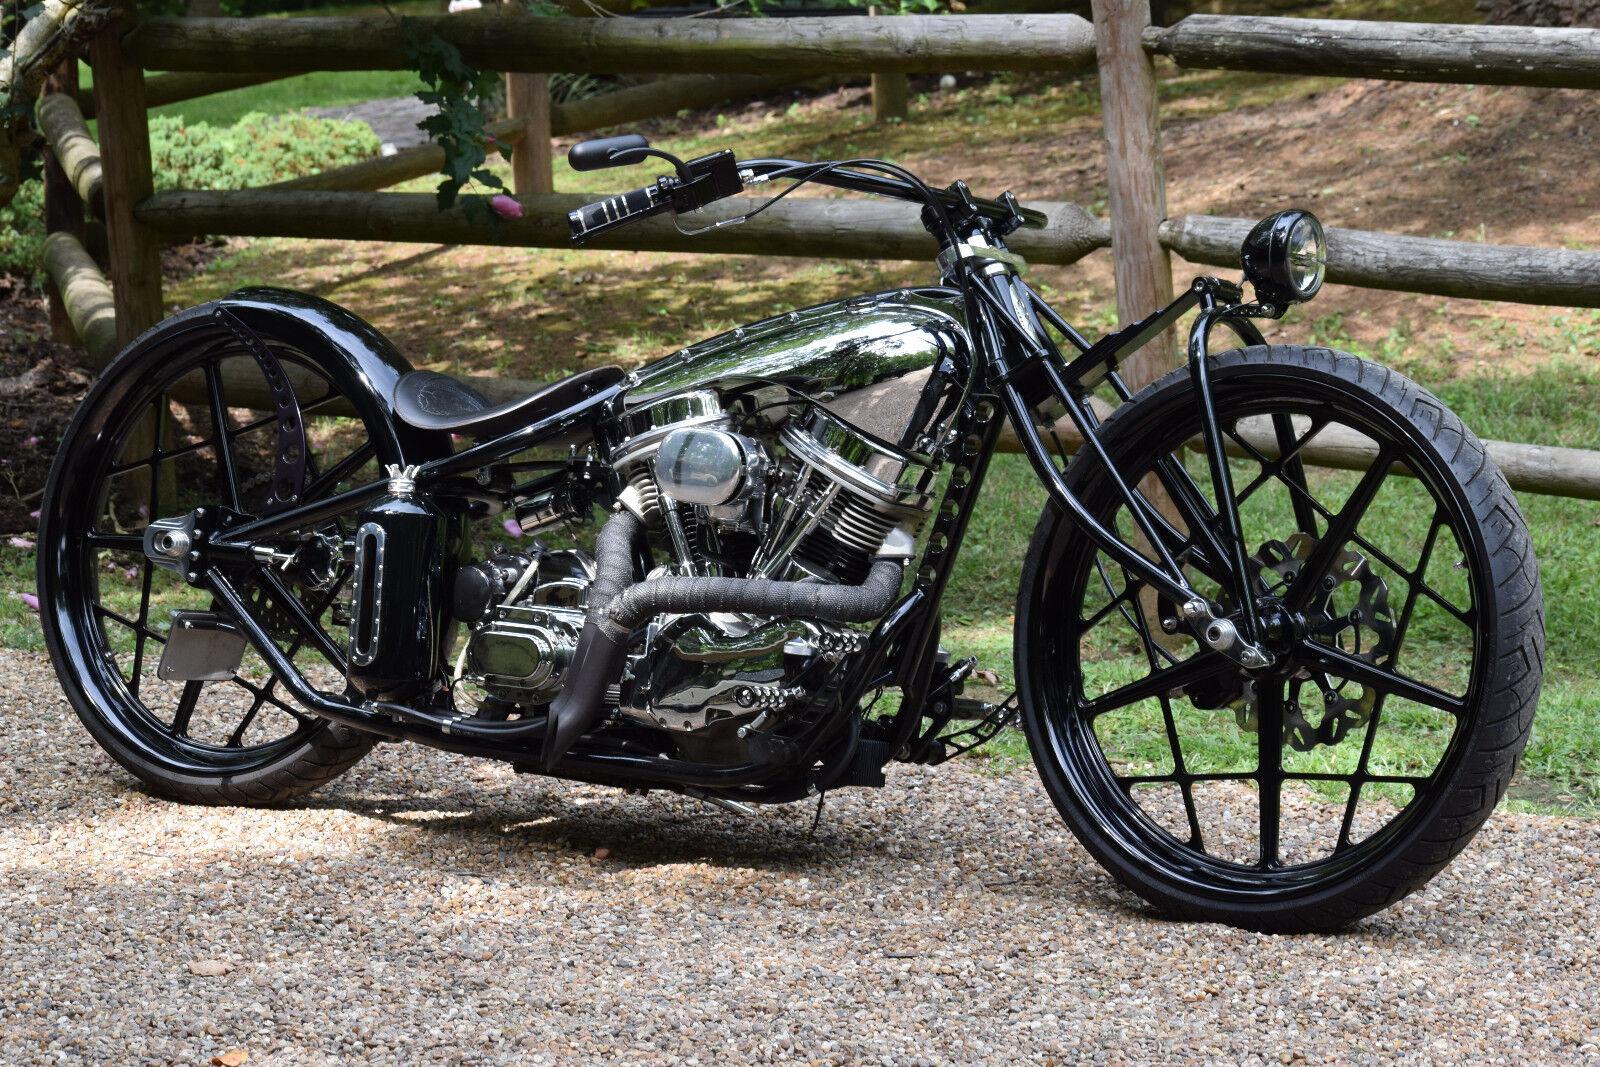 2016 Custom Built Motorcycles Bobber  CUSTOM HOT ROD BOBBER BOARDTRACK PANHEAD